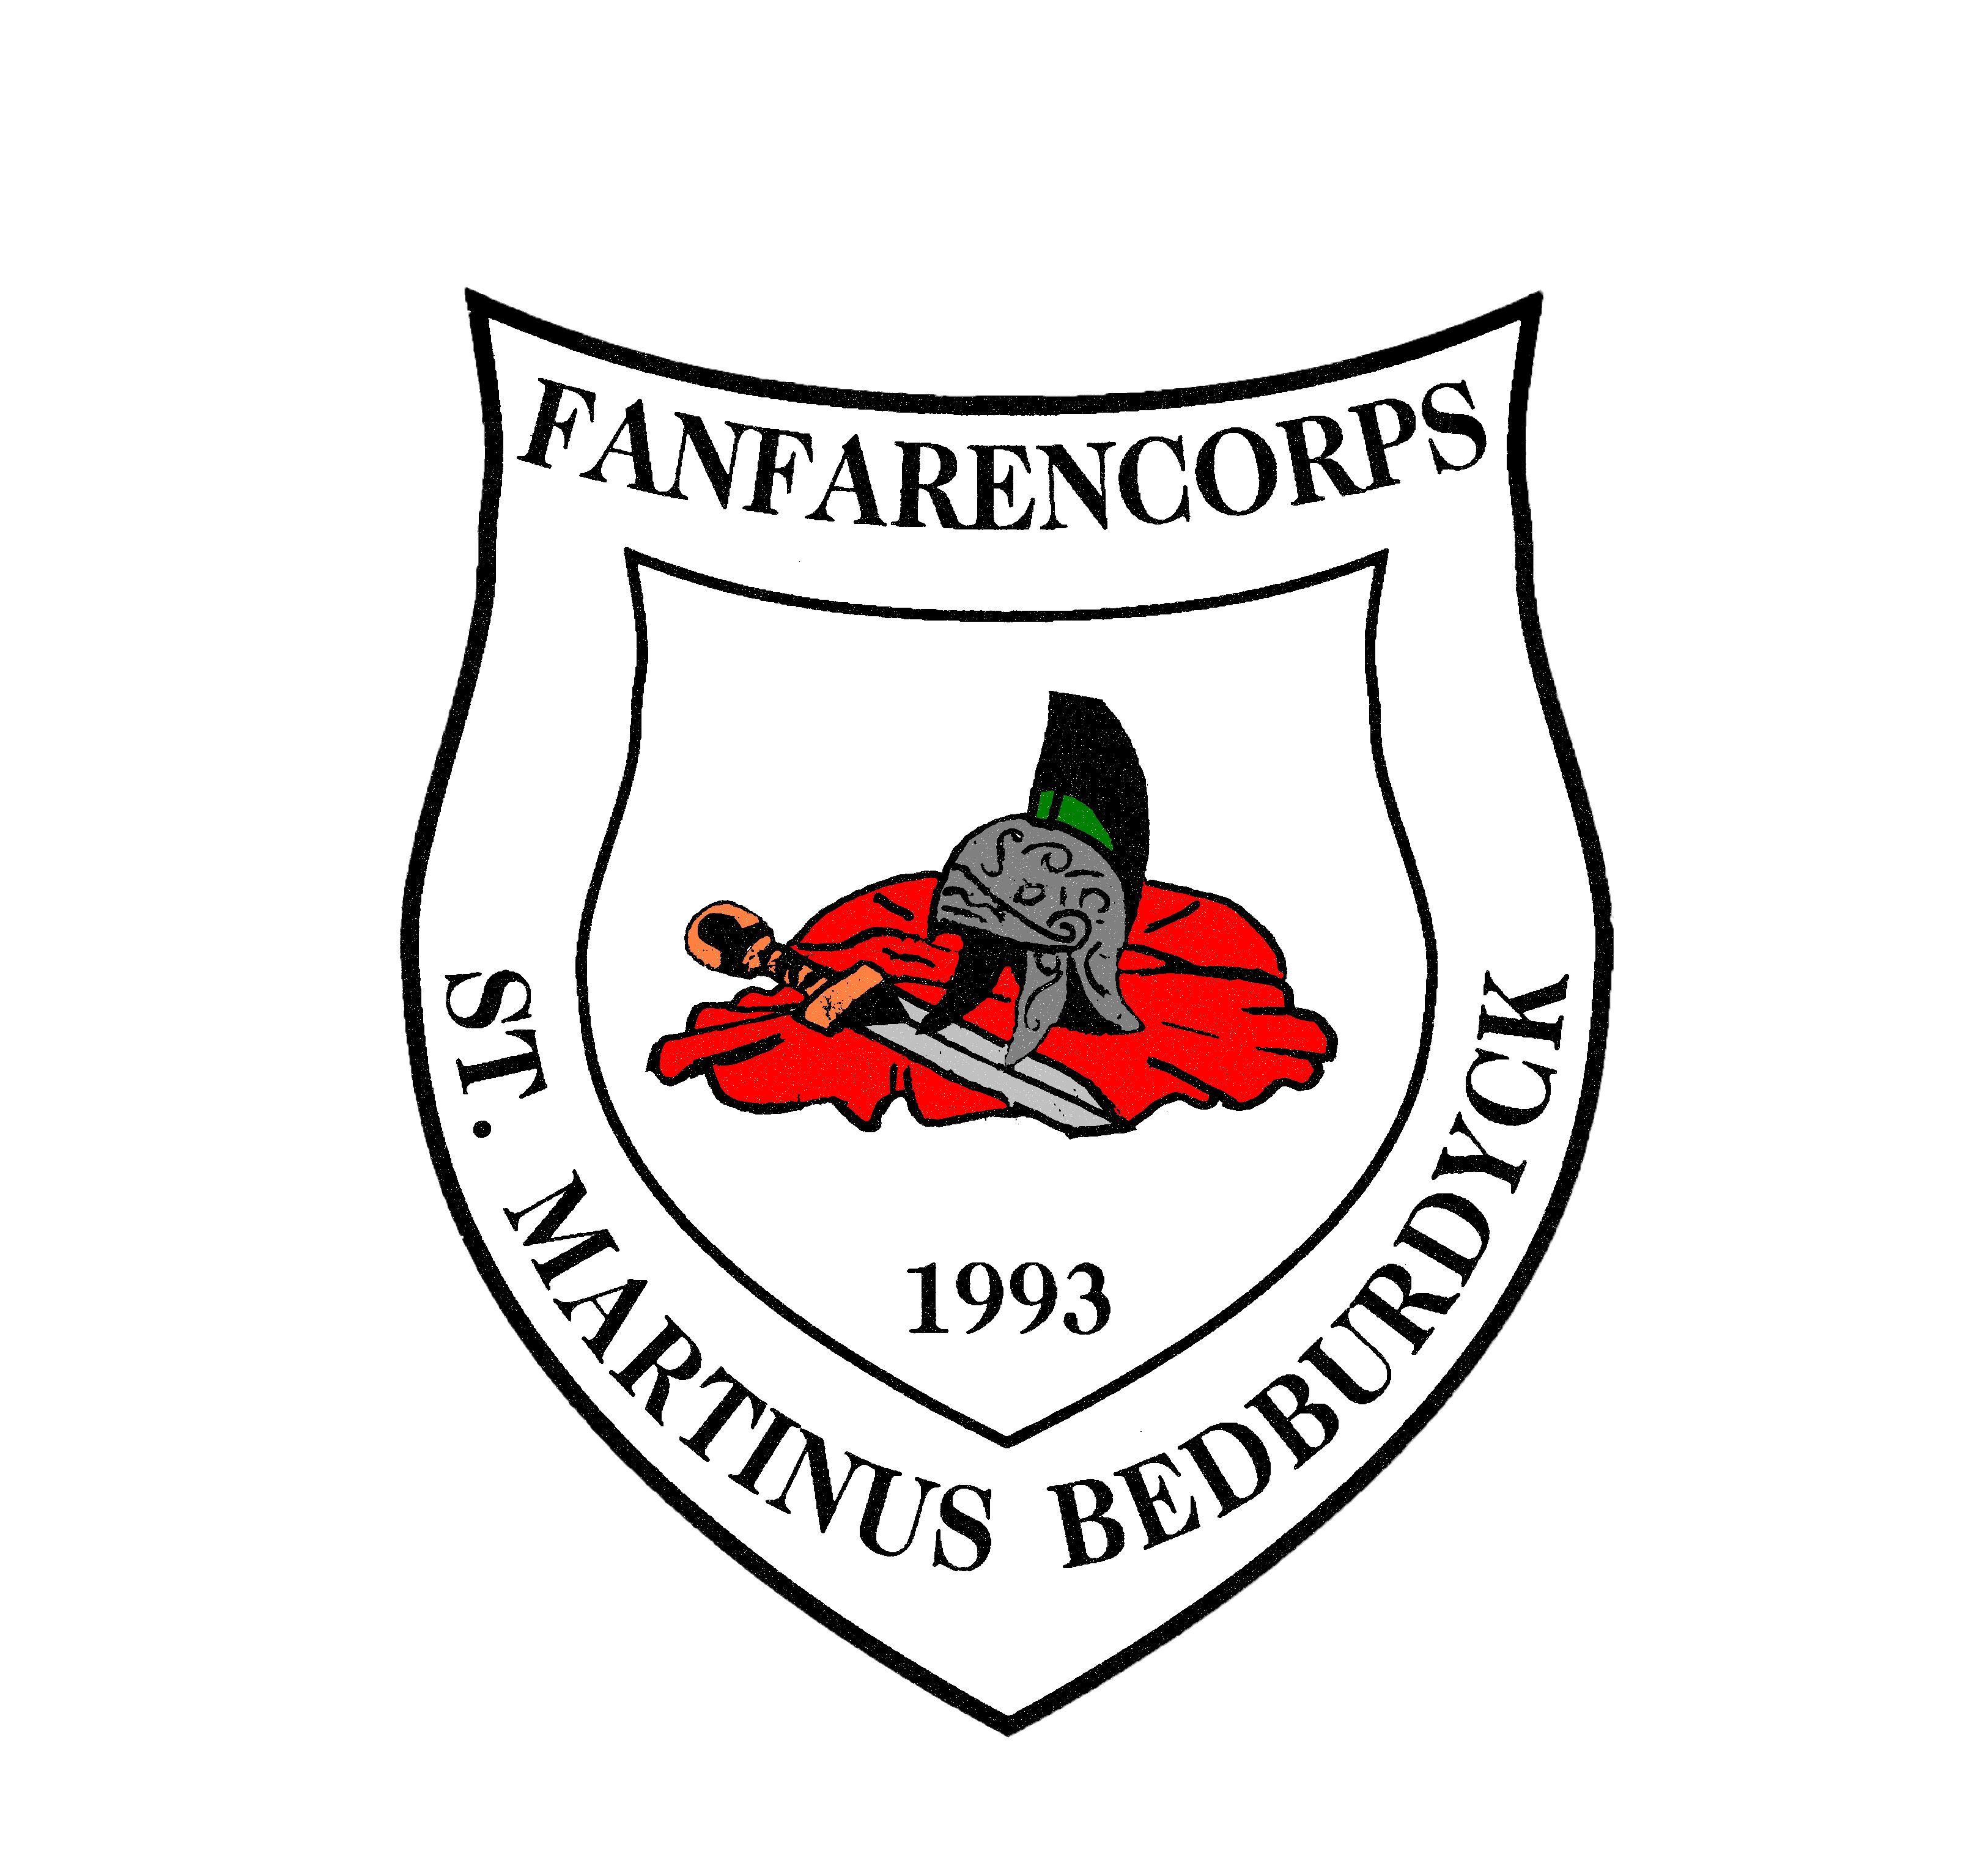 Fanfarencorps St. Martinus Bedburdyck 1993 e.V.